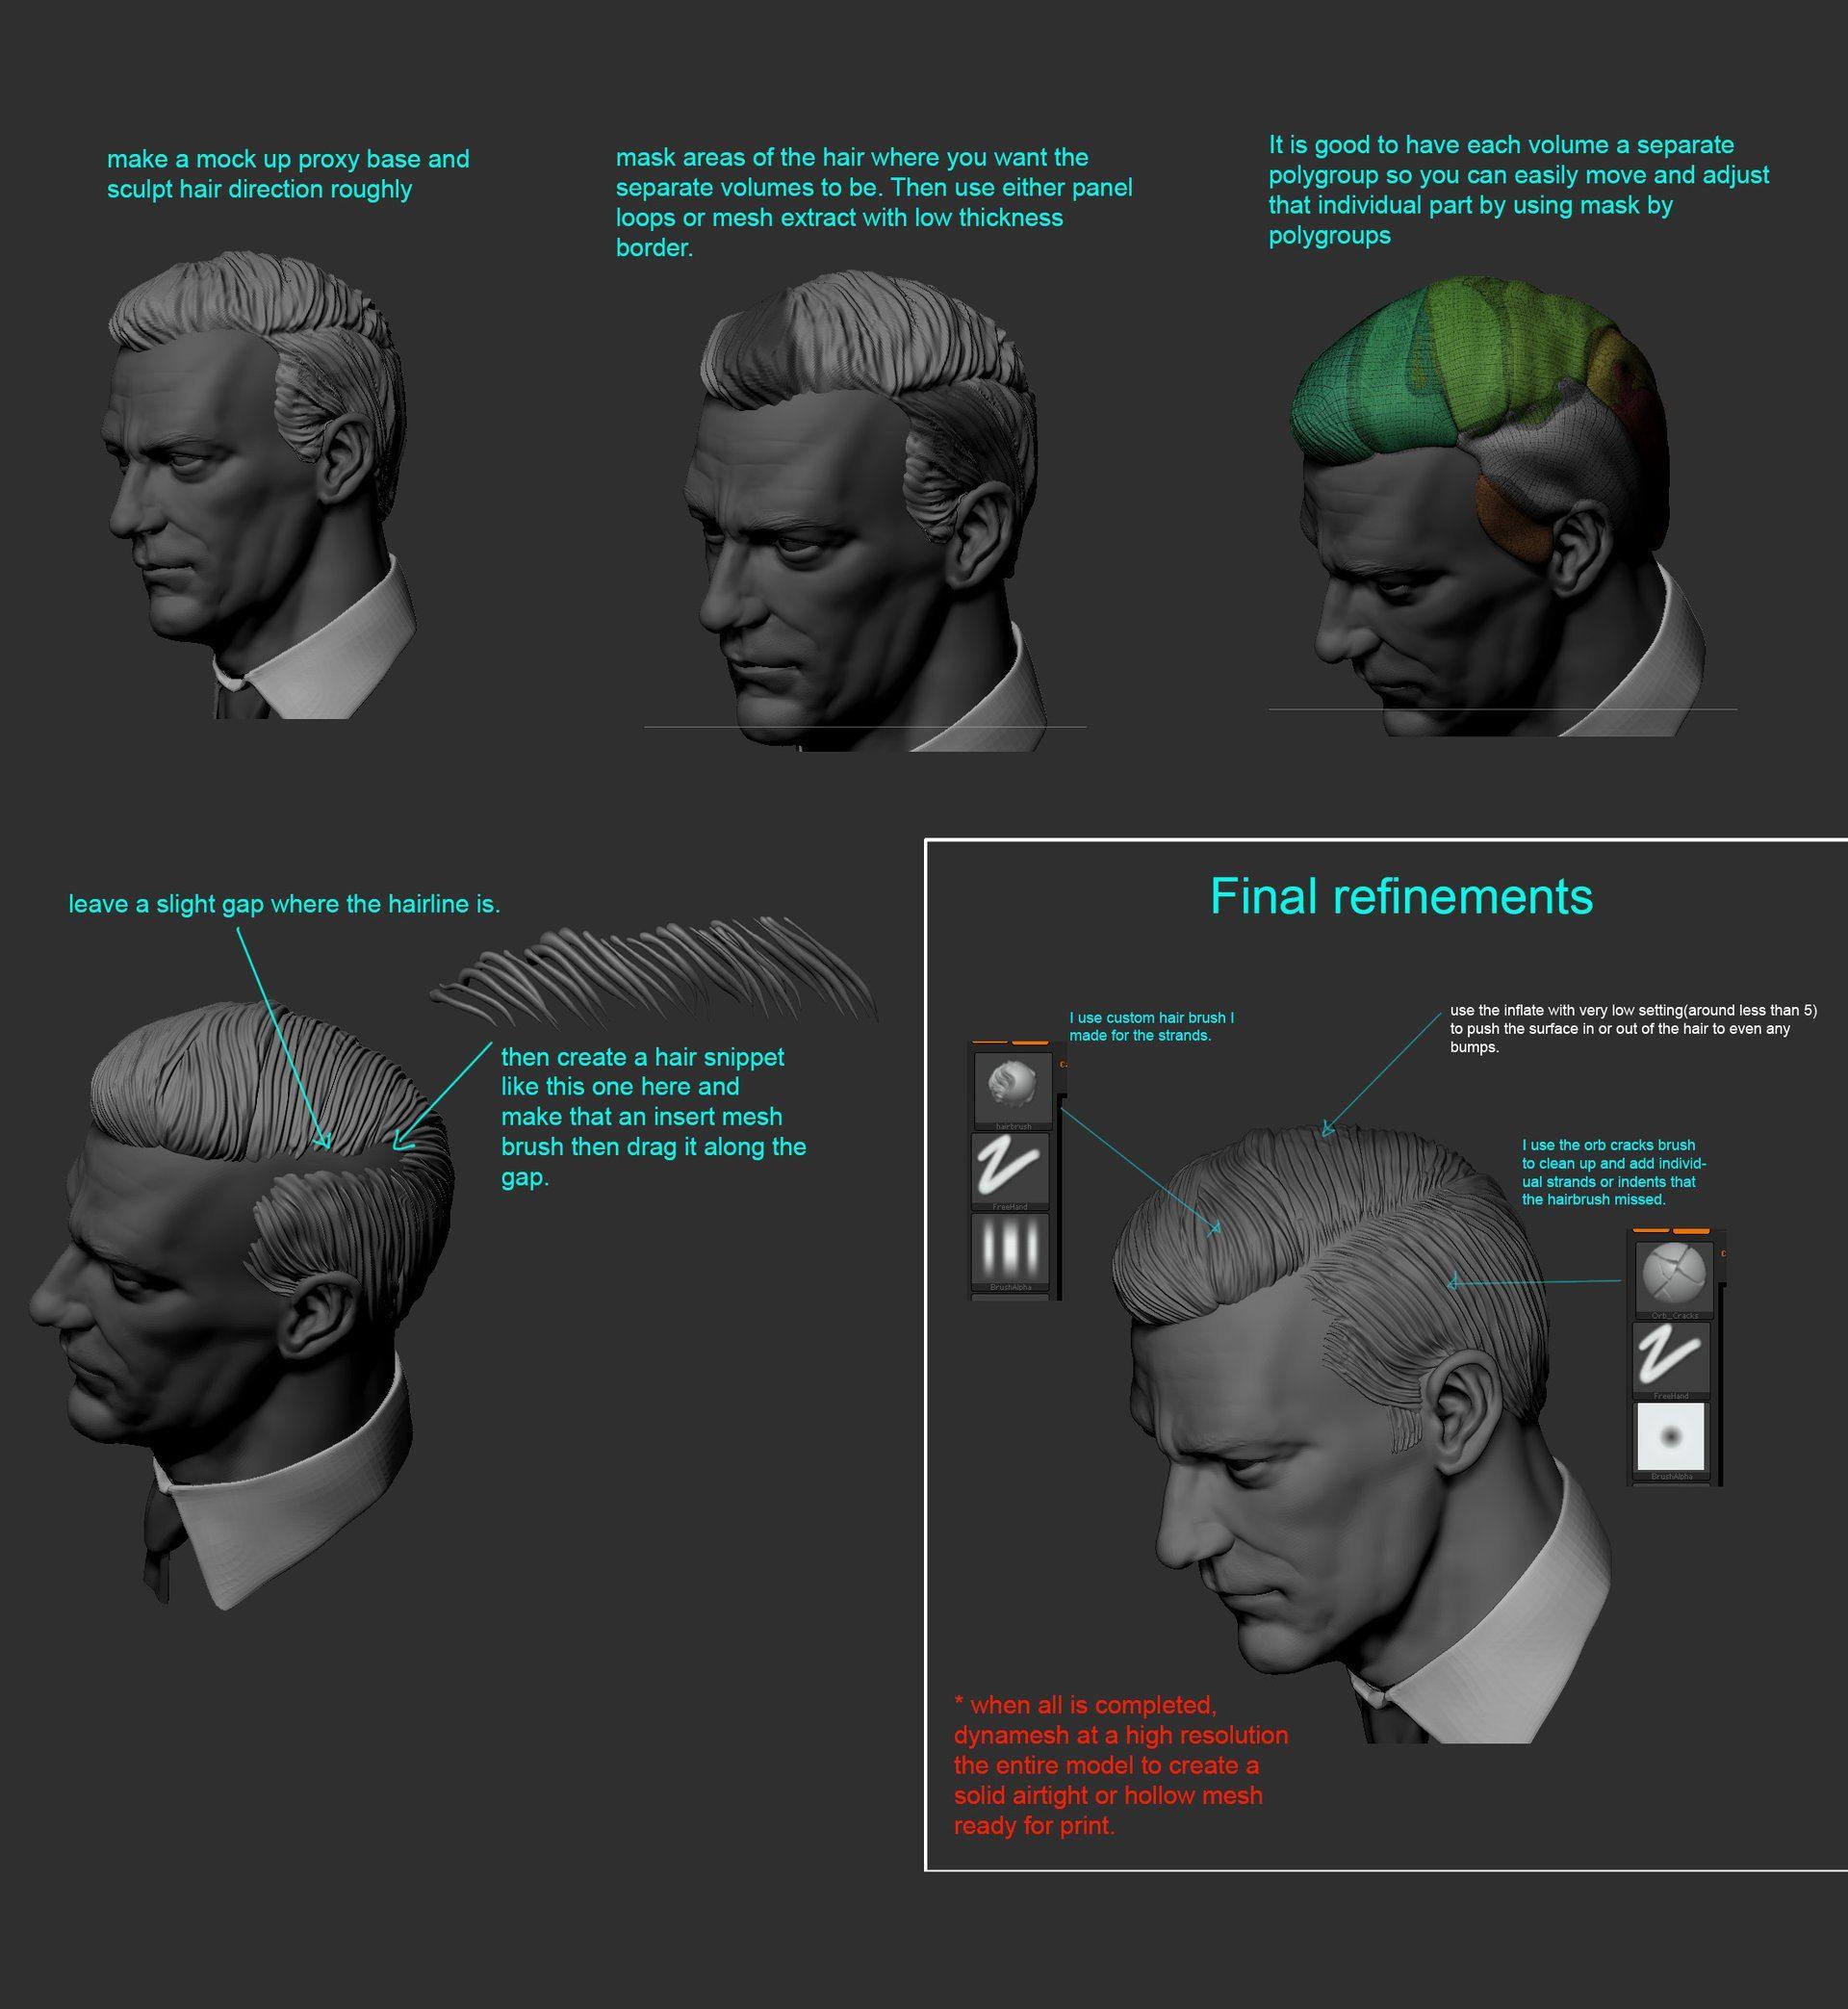 Zbrush #Anatomy #Tutorial #Tips #Character #ZRemesher #Dynamesh ...